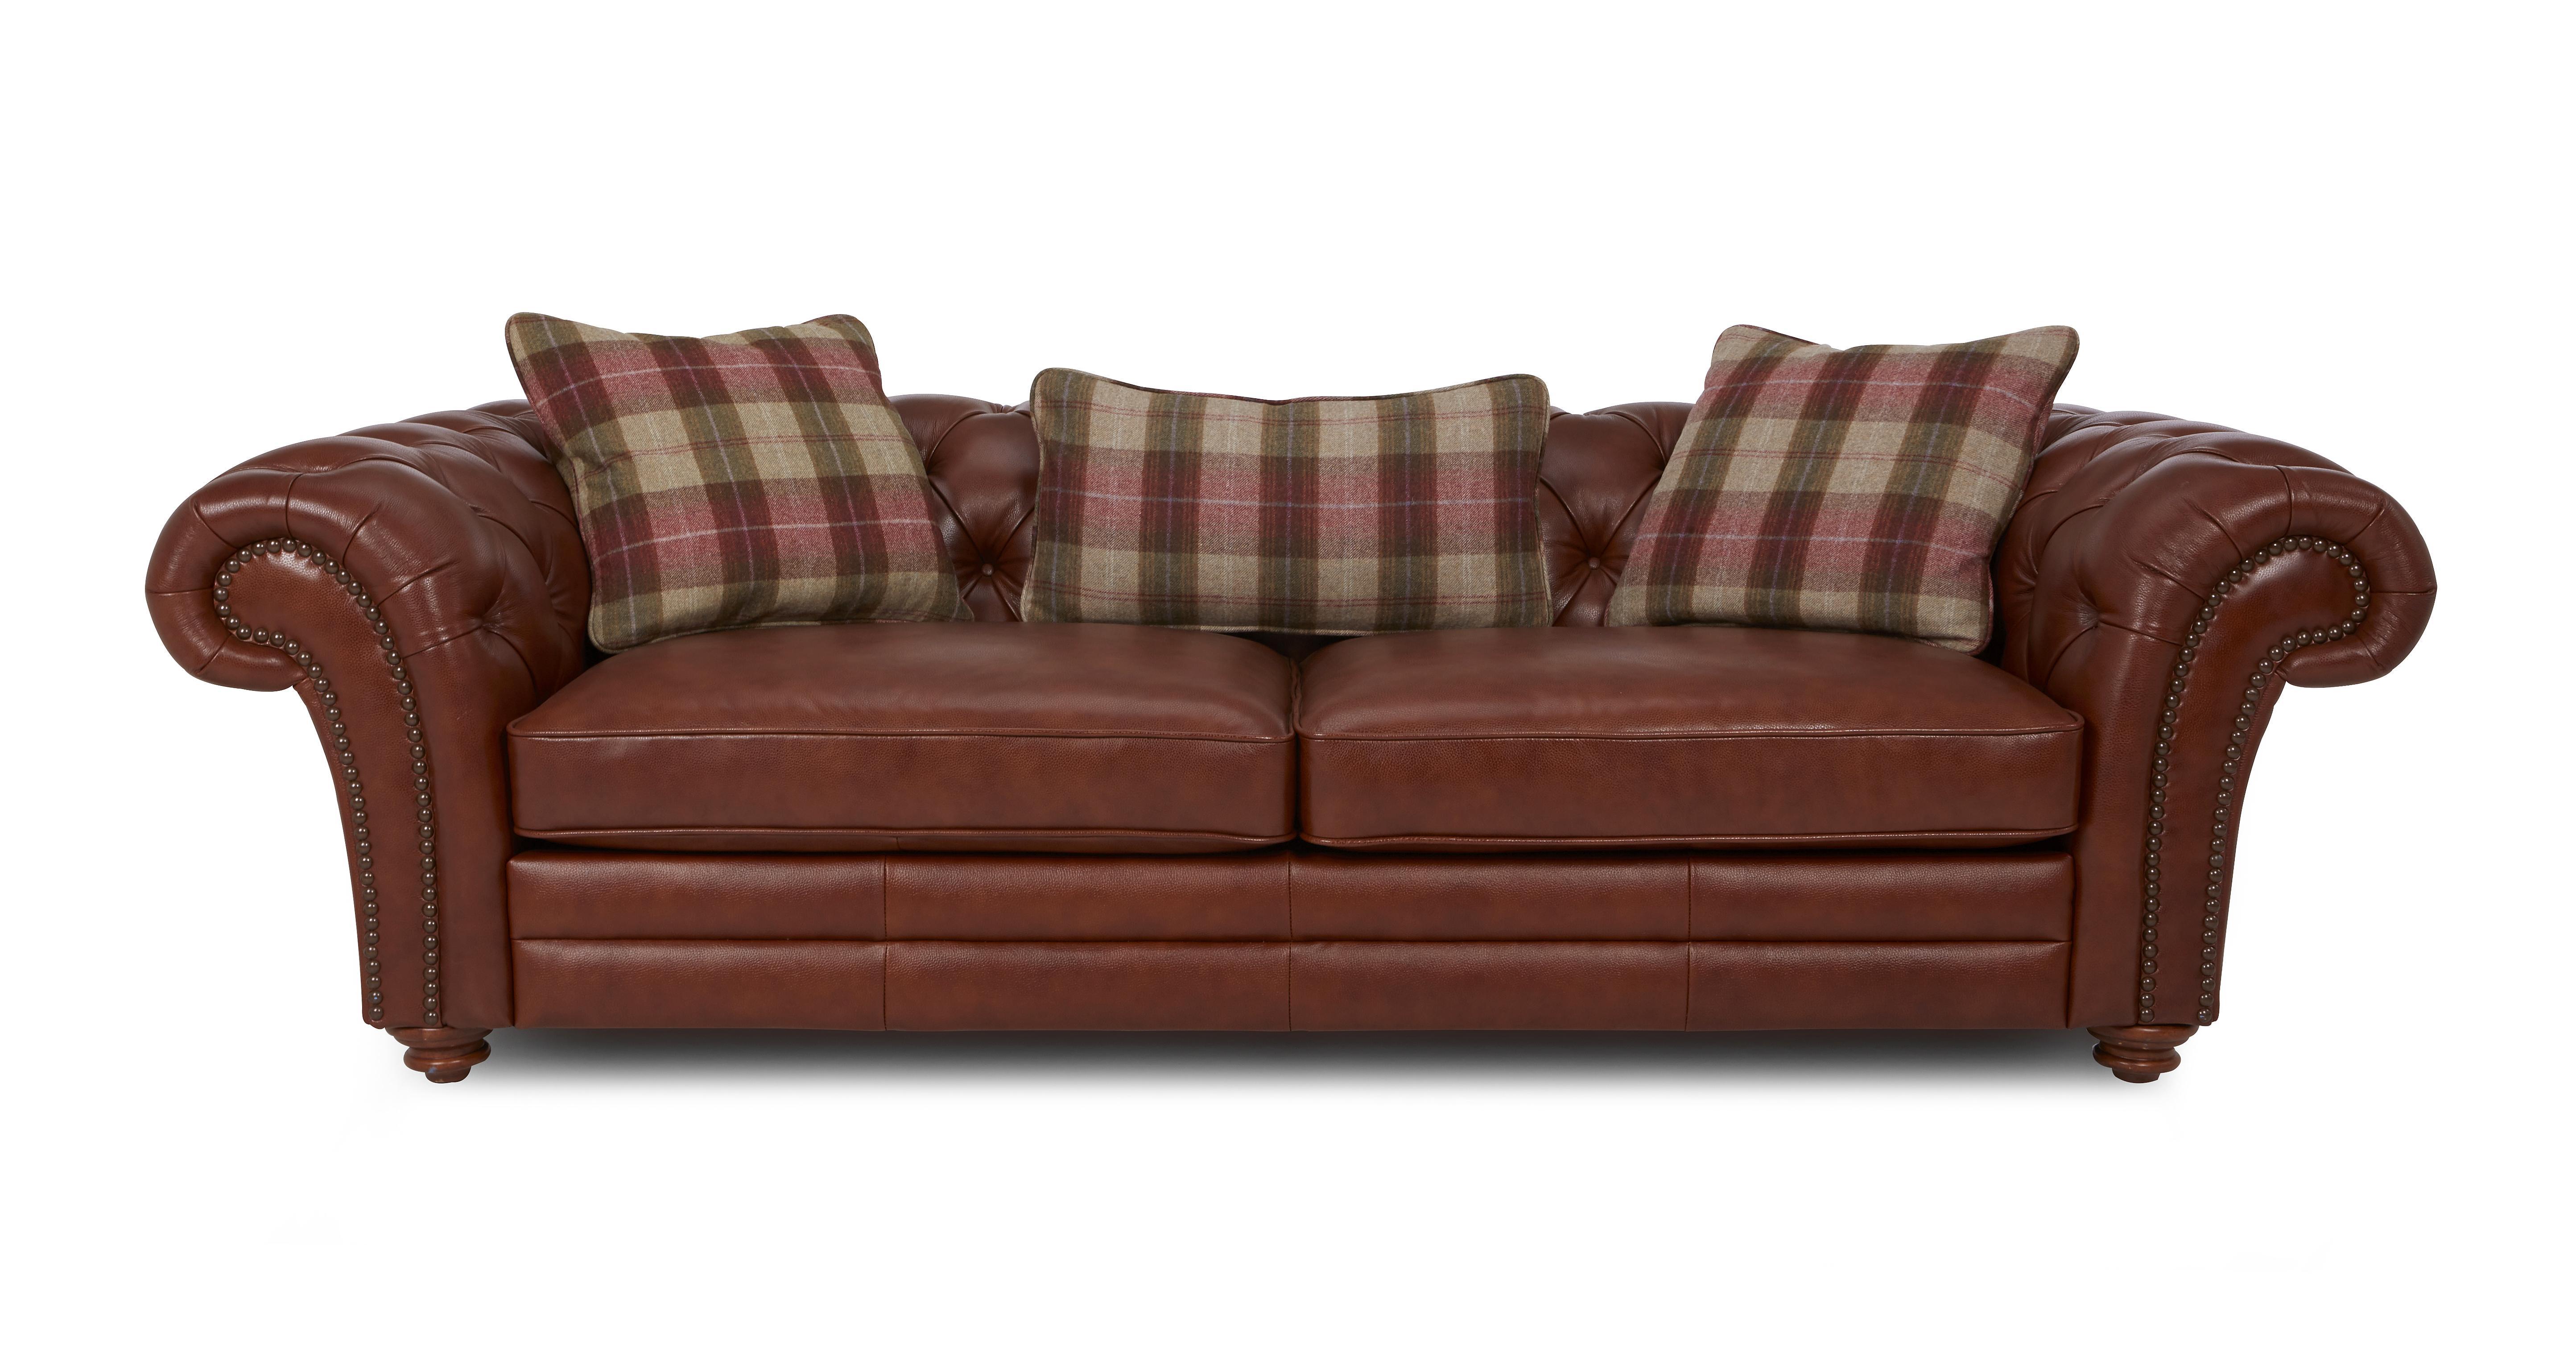 Beckford 3 Seater Sofa Ohio DFS Ireland